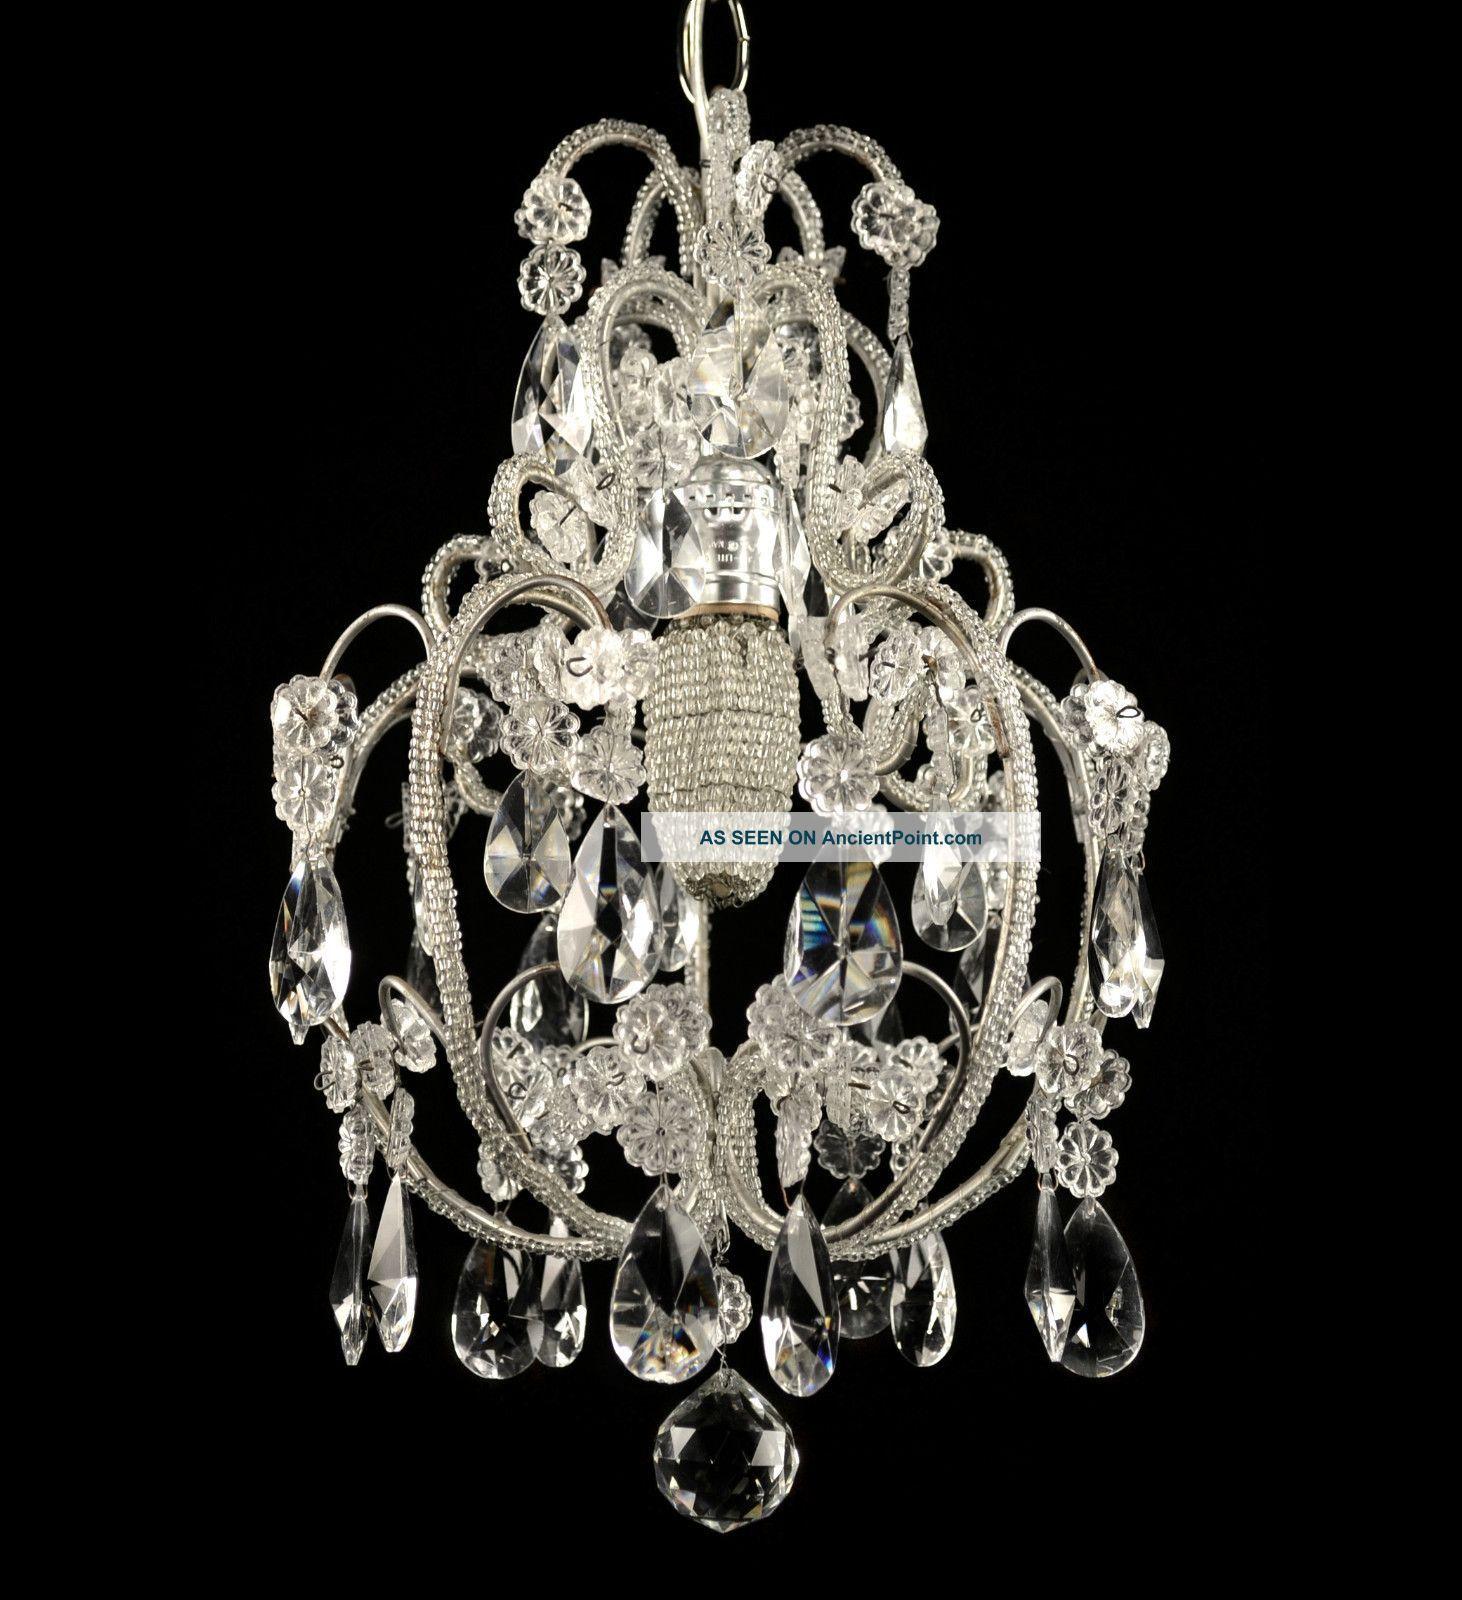 Antique chandeliers antique crystal chandelier vintage glass light antique chandeliers antique crystal chandelier vintage glass light pendant french italian arubaitofo Choice Image